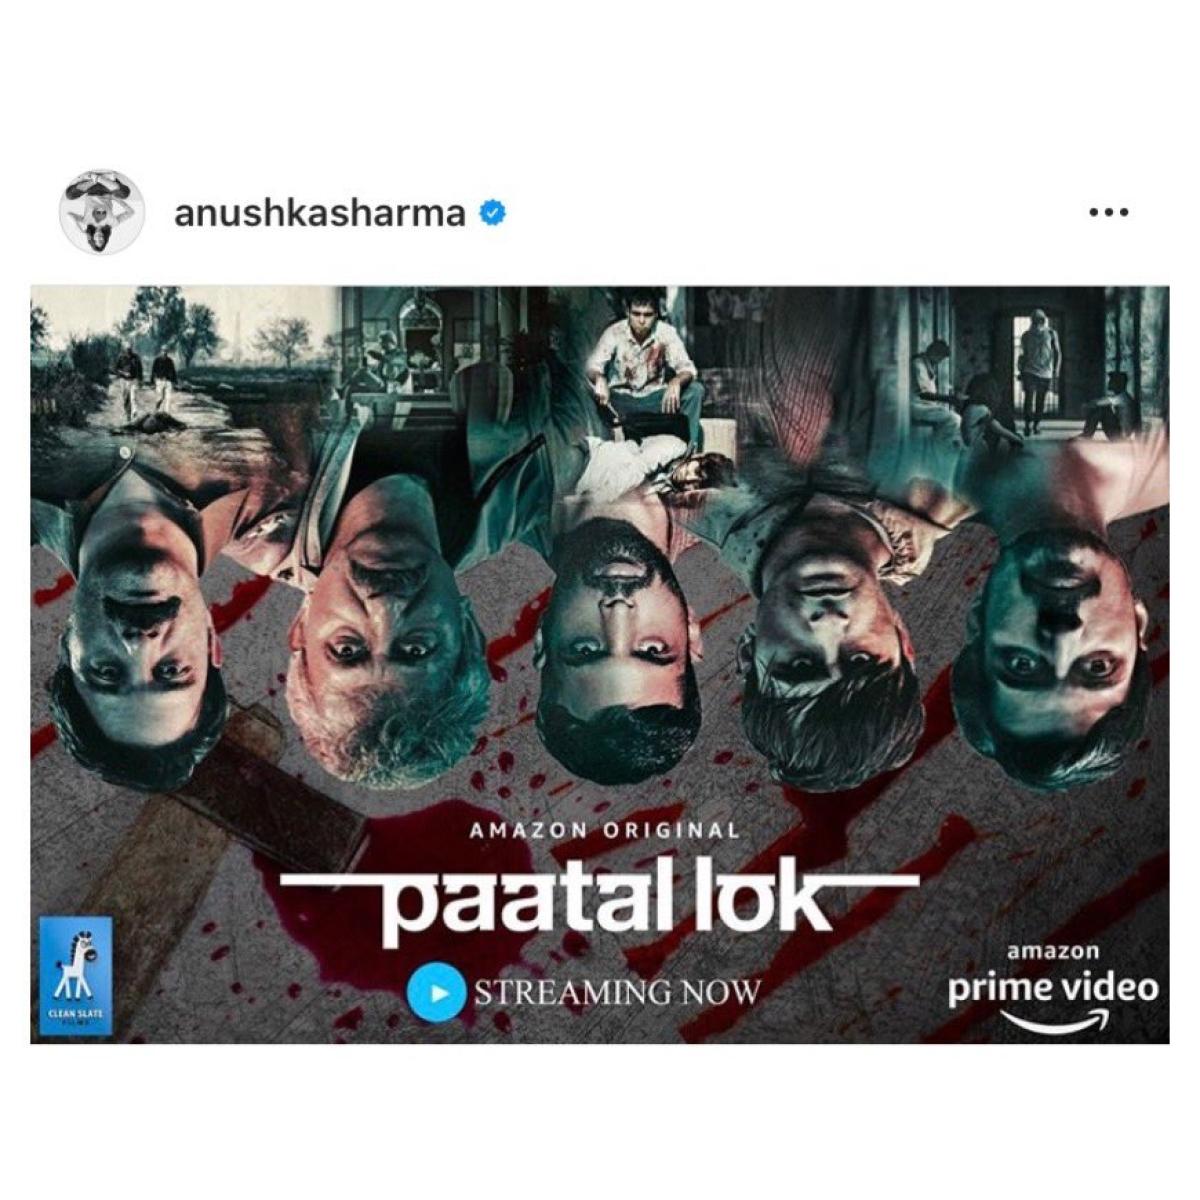 Producer of the show, Anushka Sharma promoting Paatal Lok